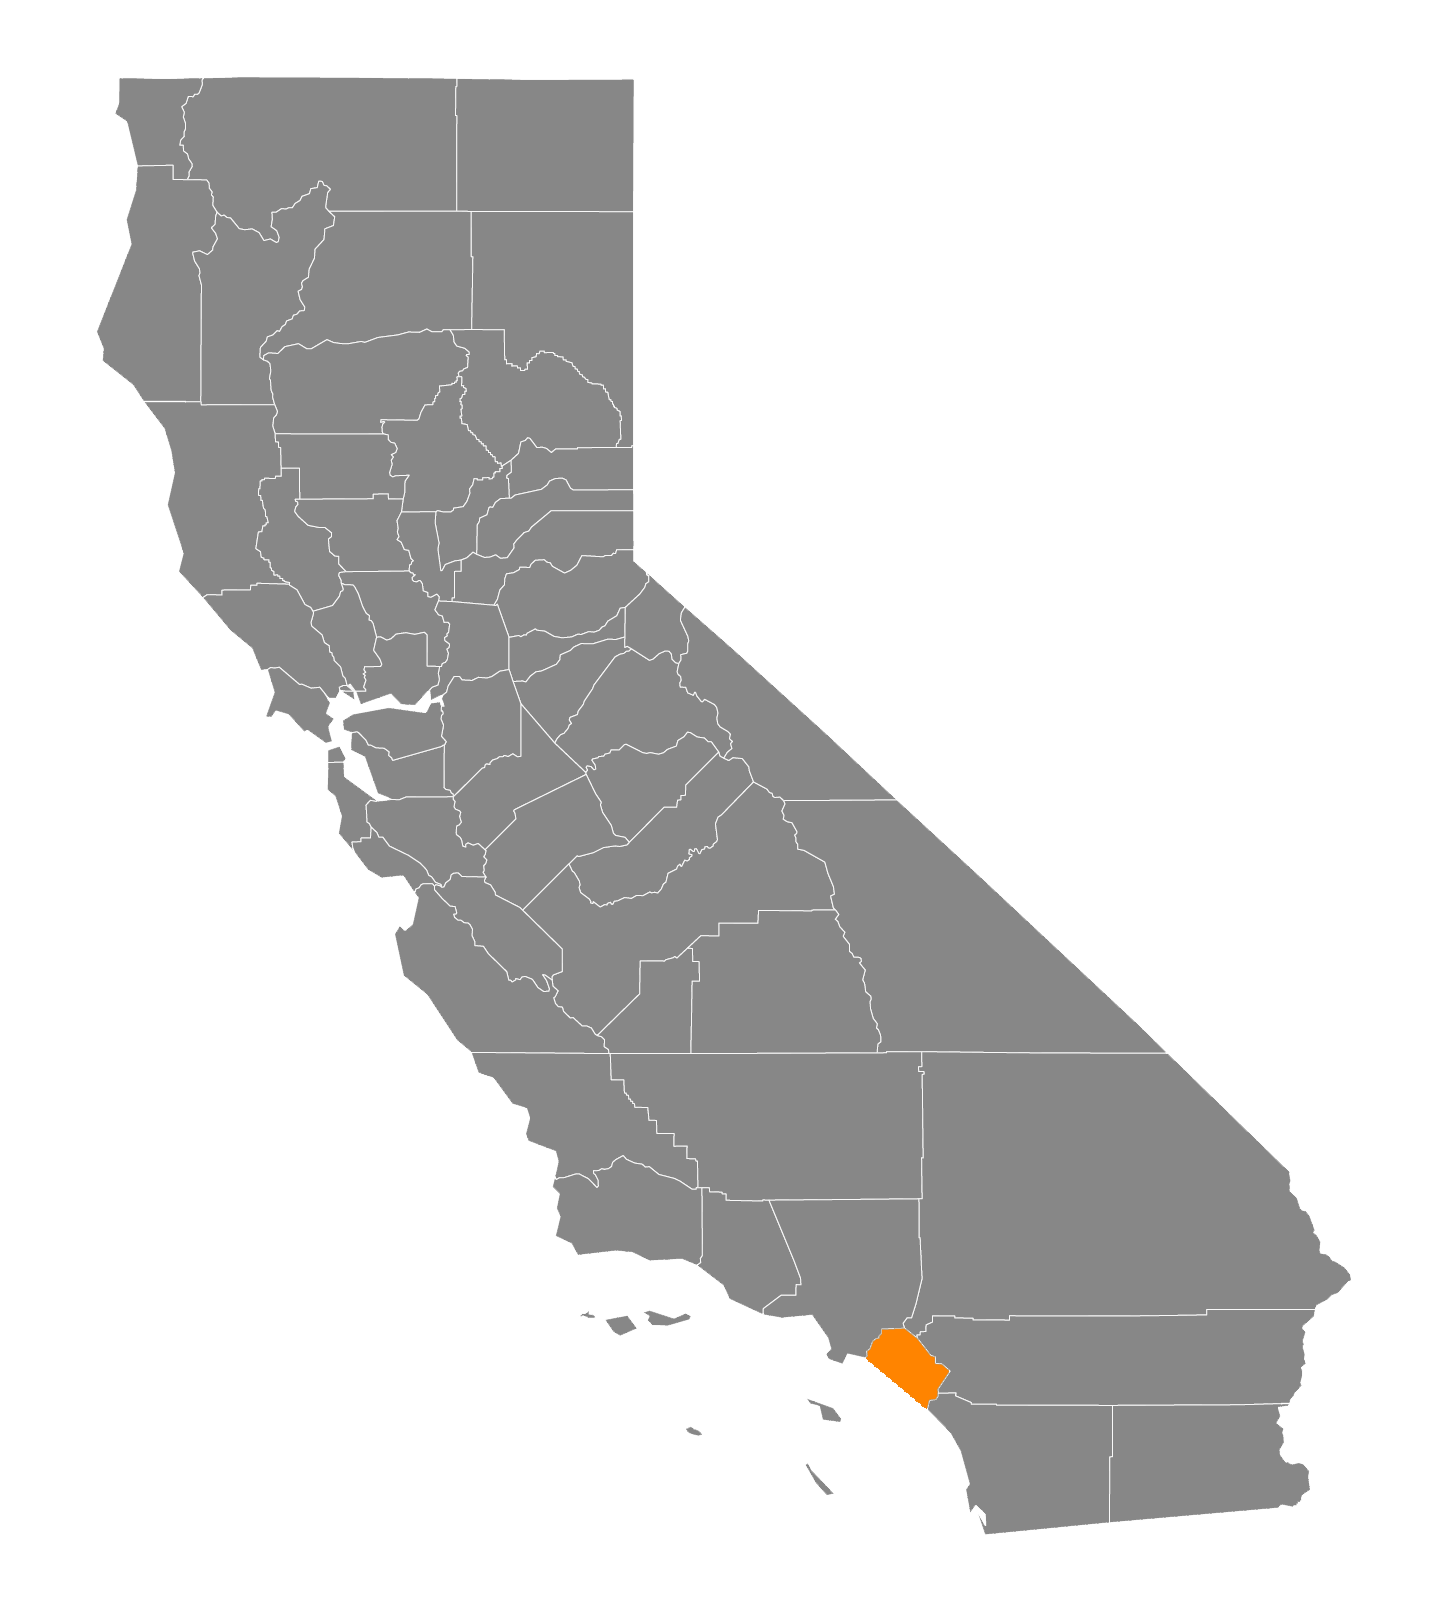 California_OC_Icon_4.png